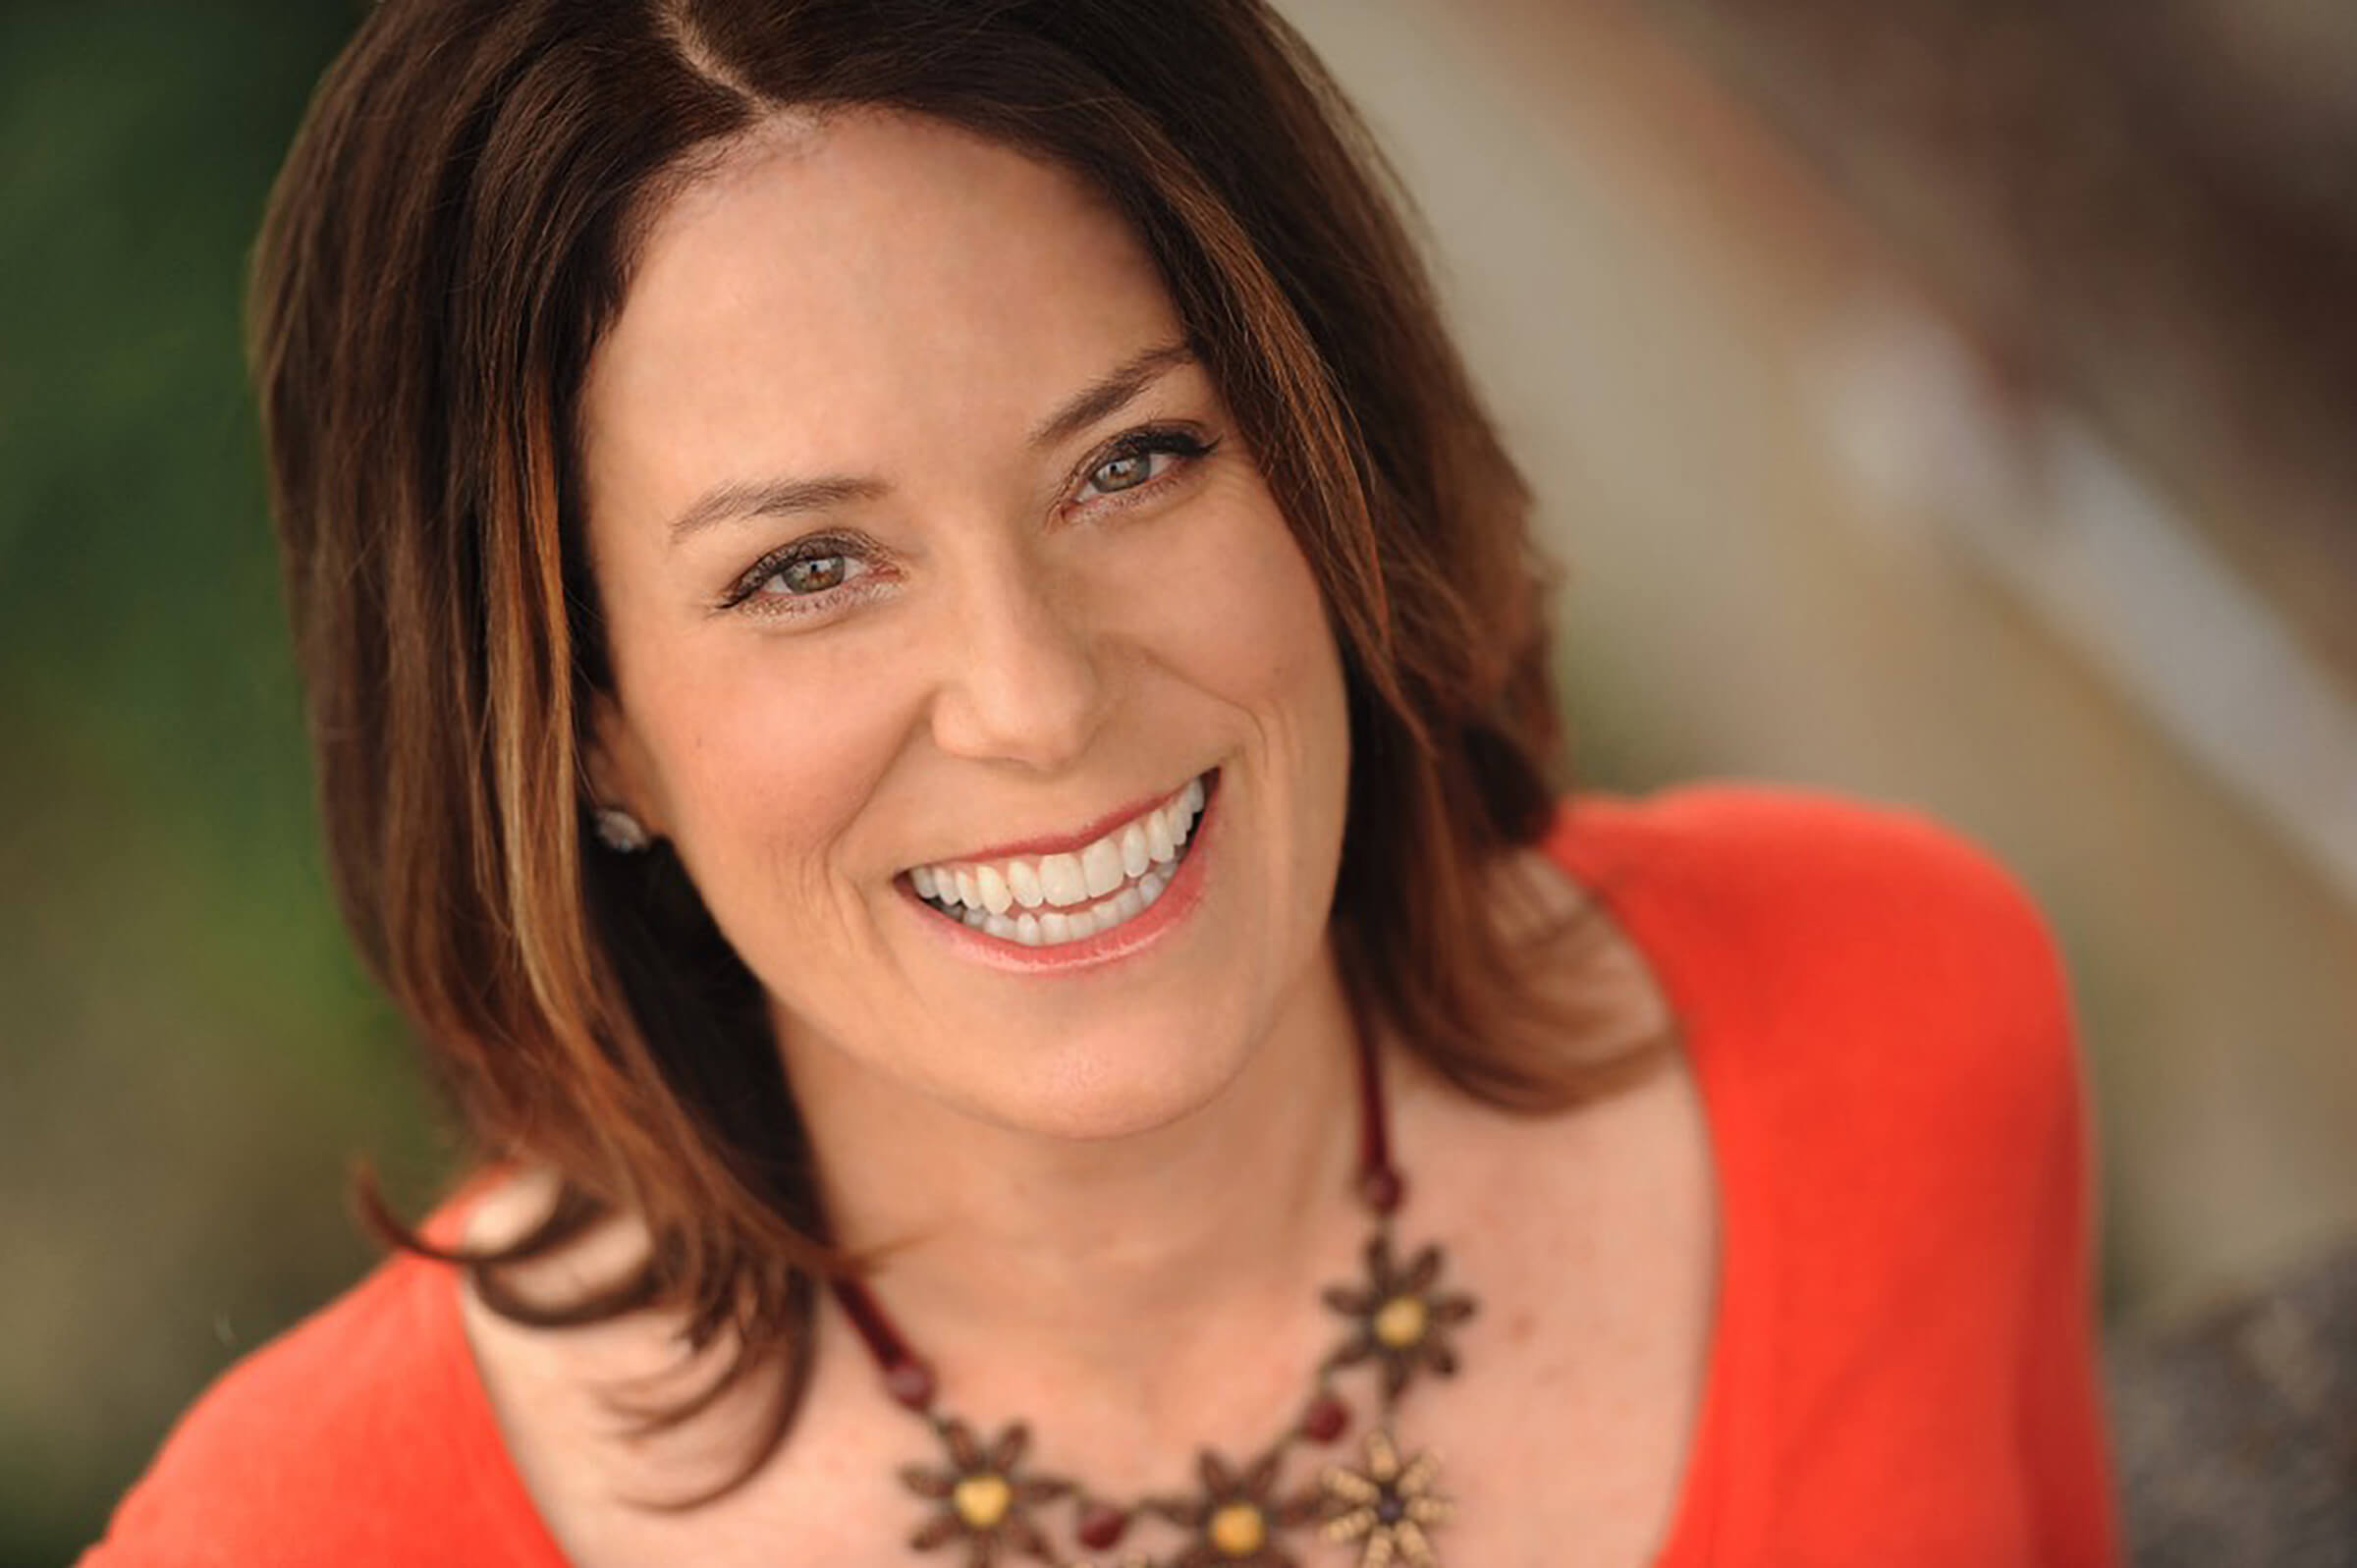 Energy healer Martha Nicholson smiling